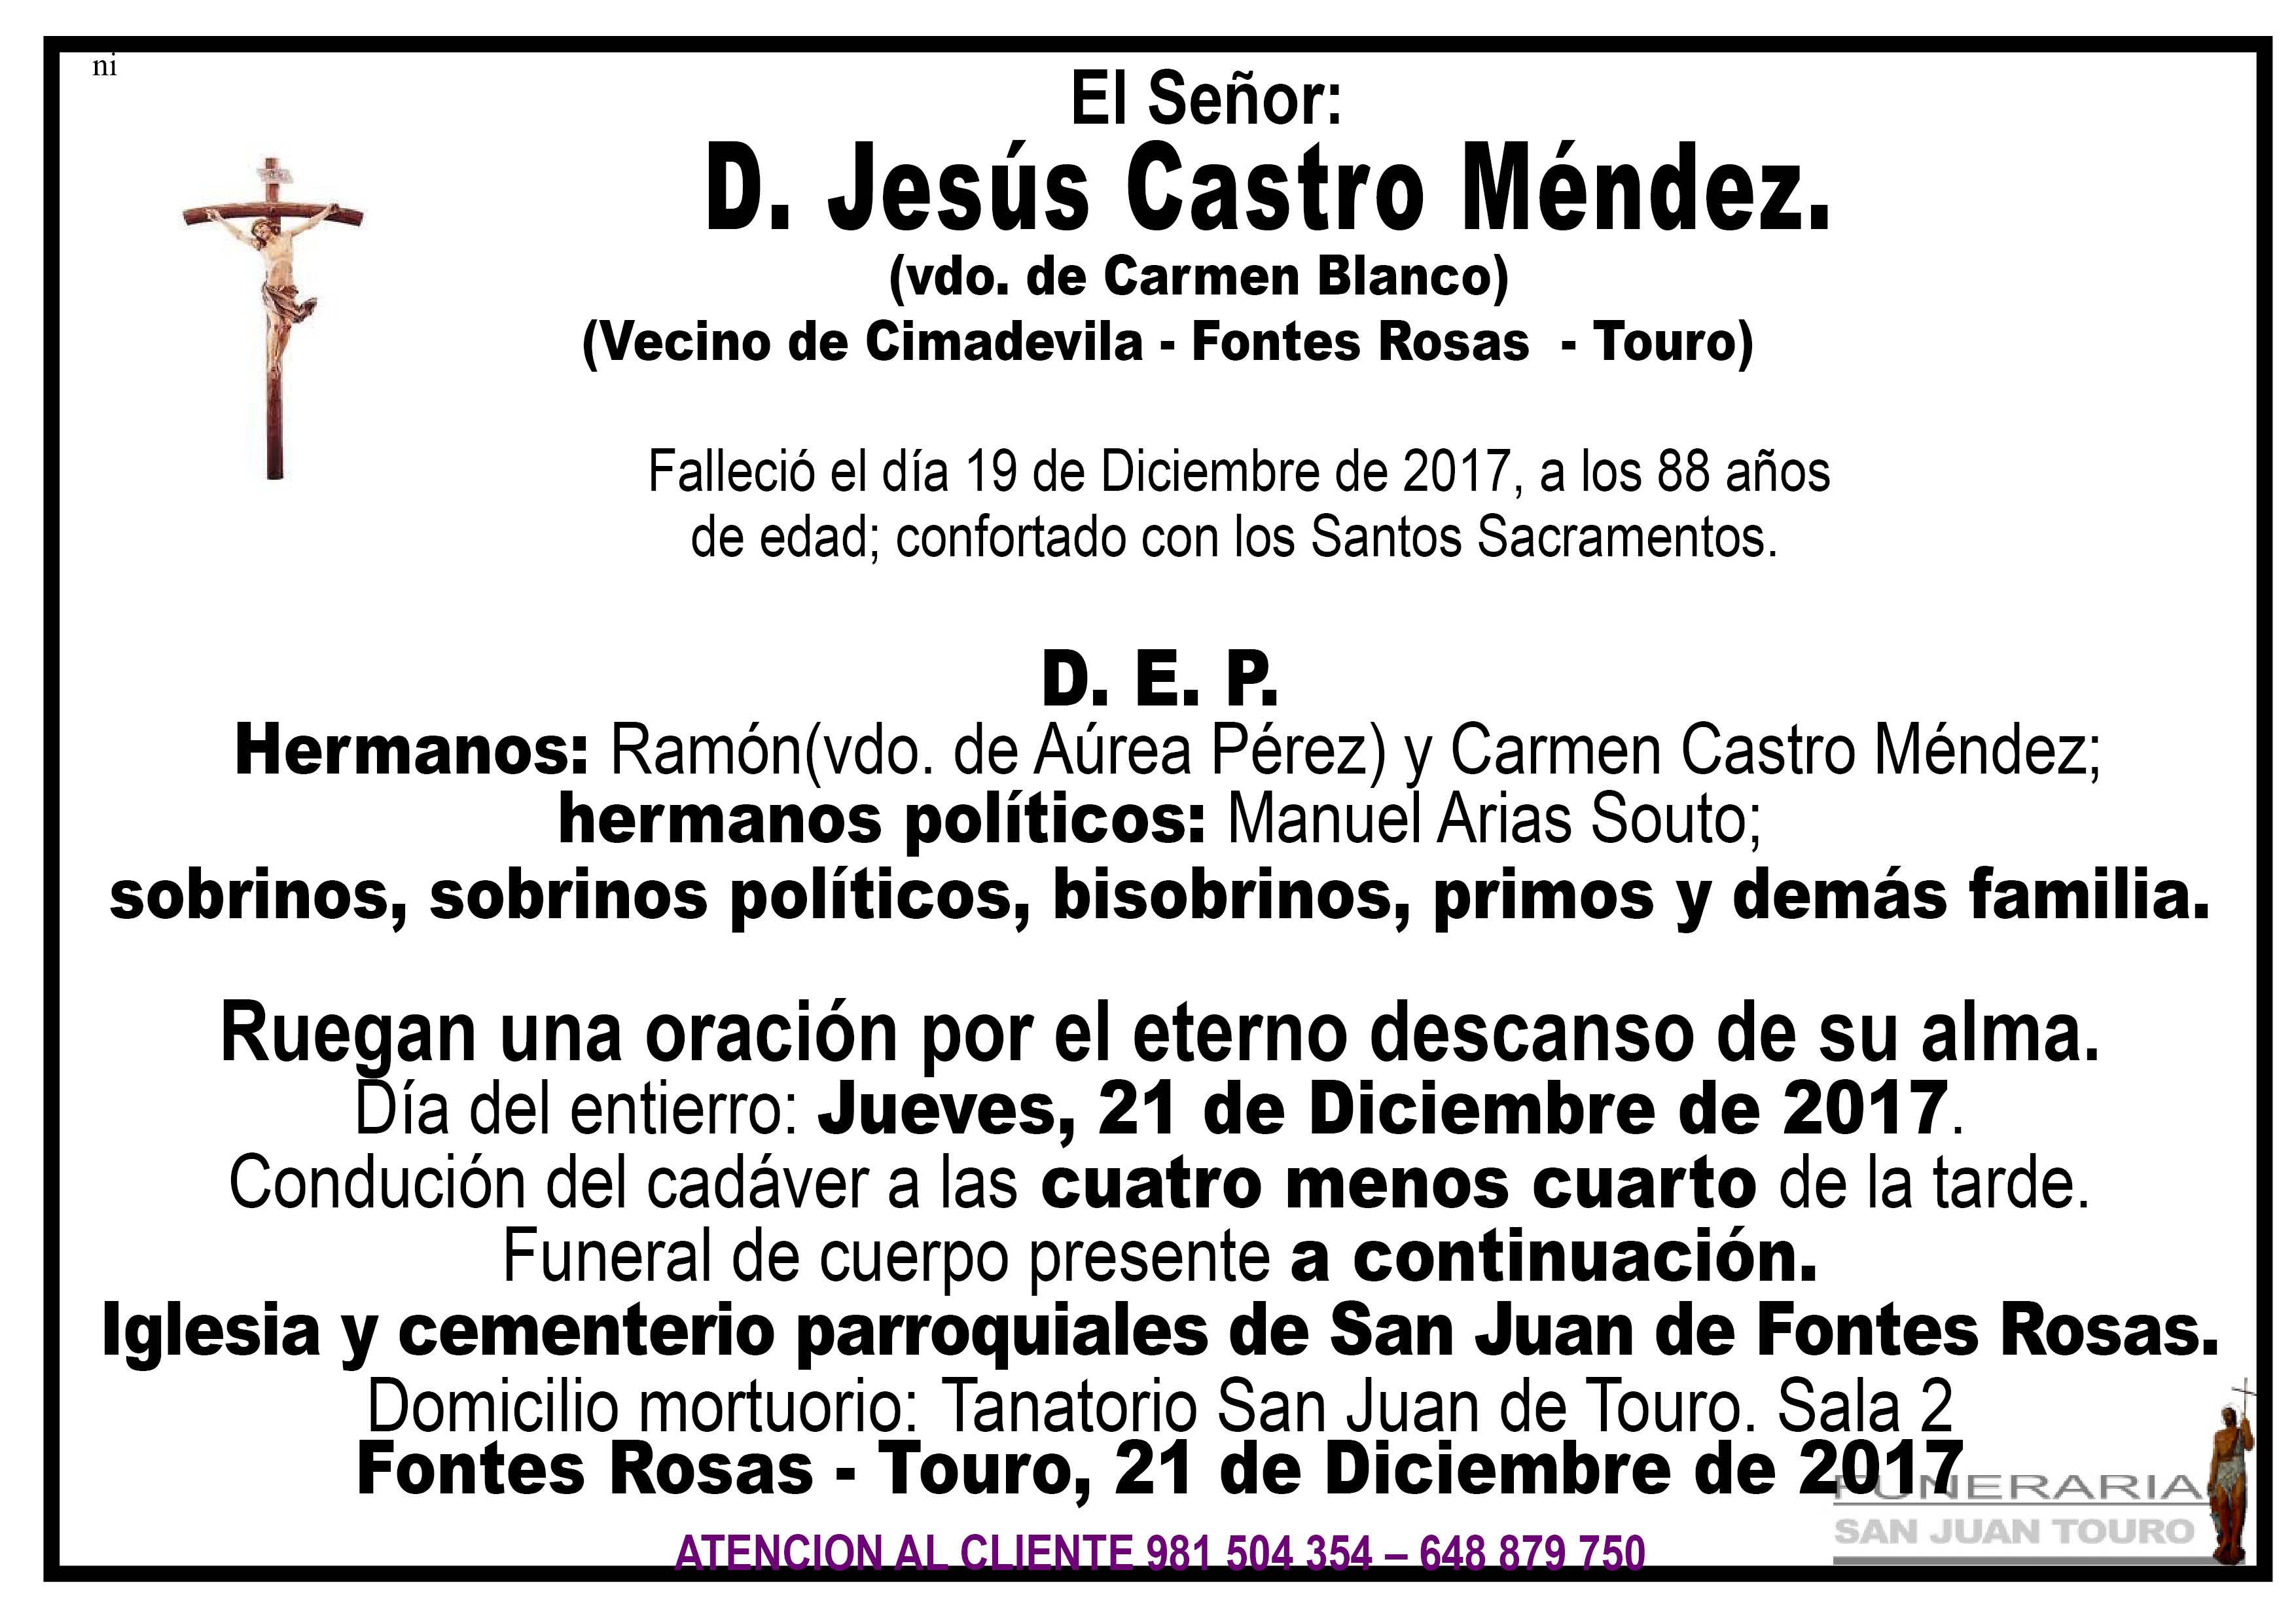 Esquela de SEPELIO DE D. JESUS CASTRO MENDEZ